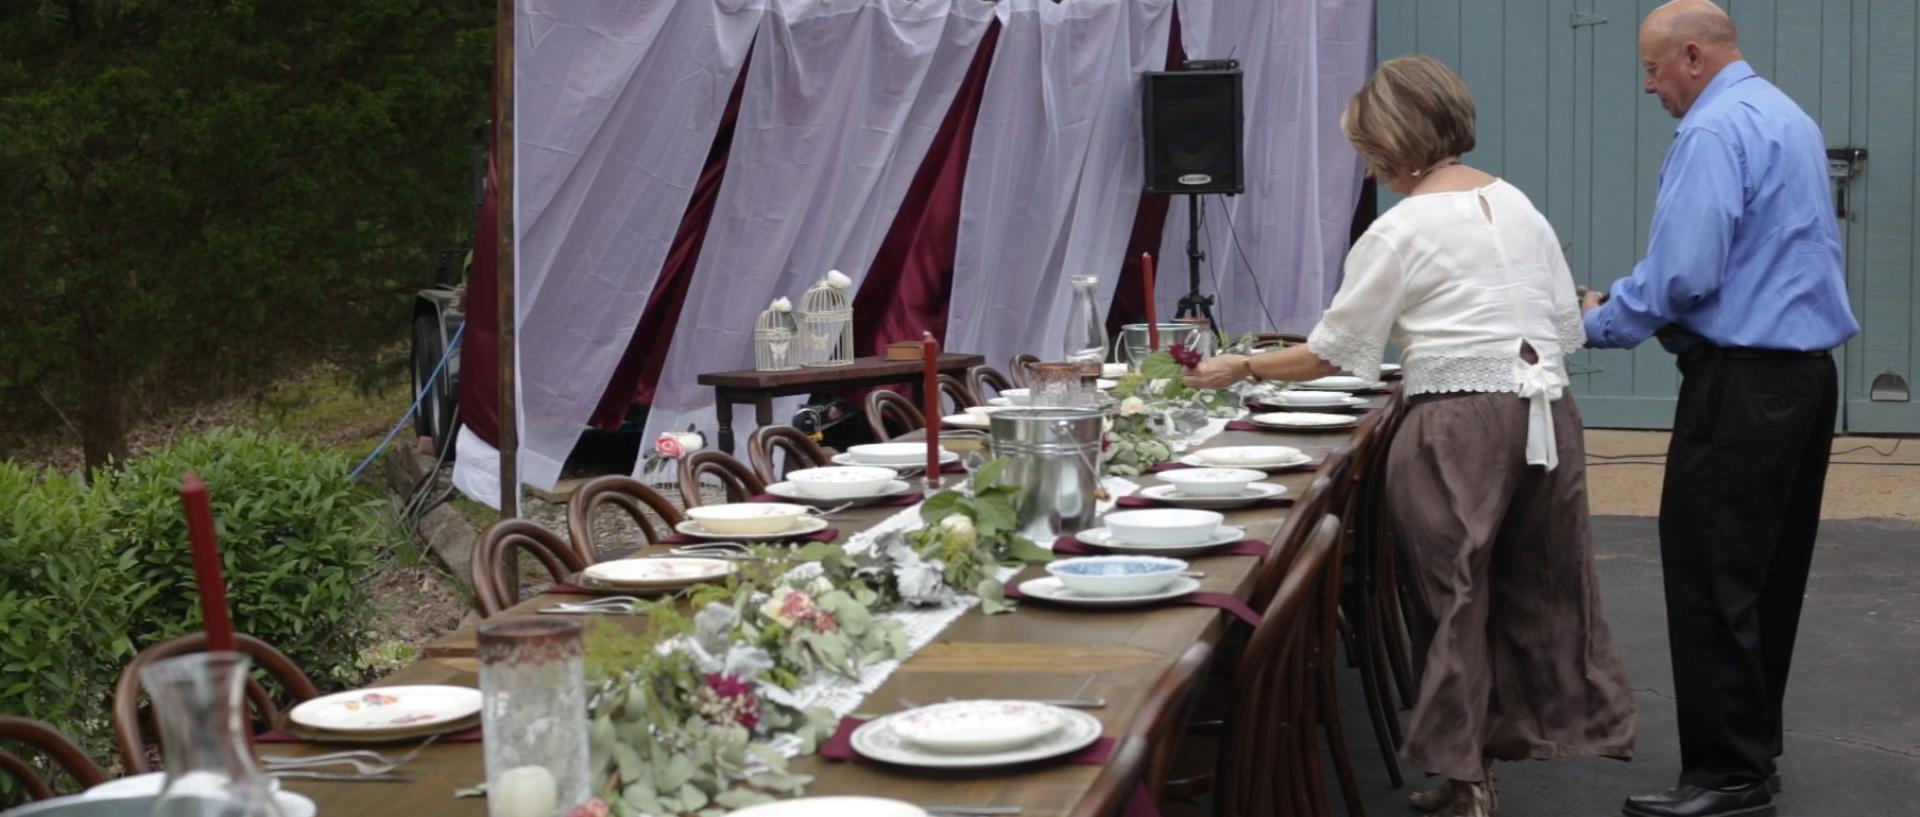 josee-corey-wedding-reception-table-flowers-amavi-films-memphis-wedding-videography.jpg